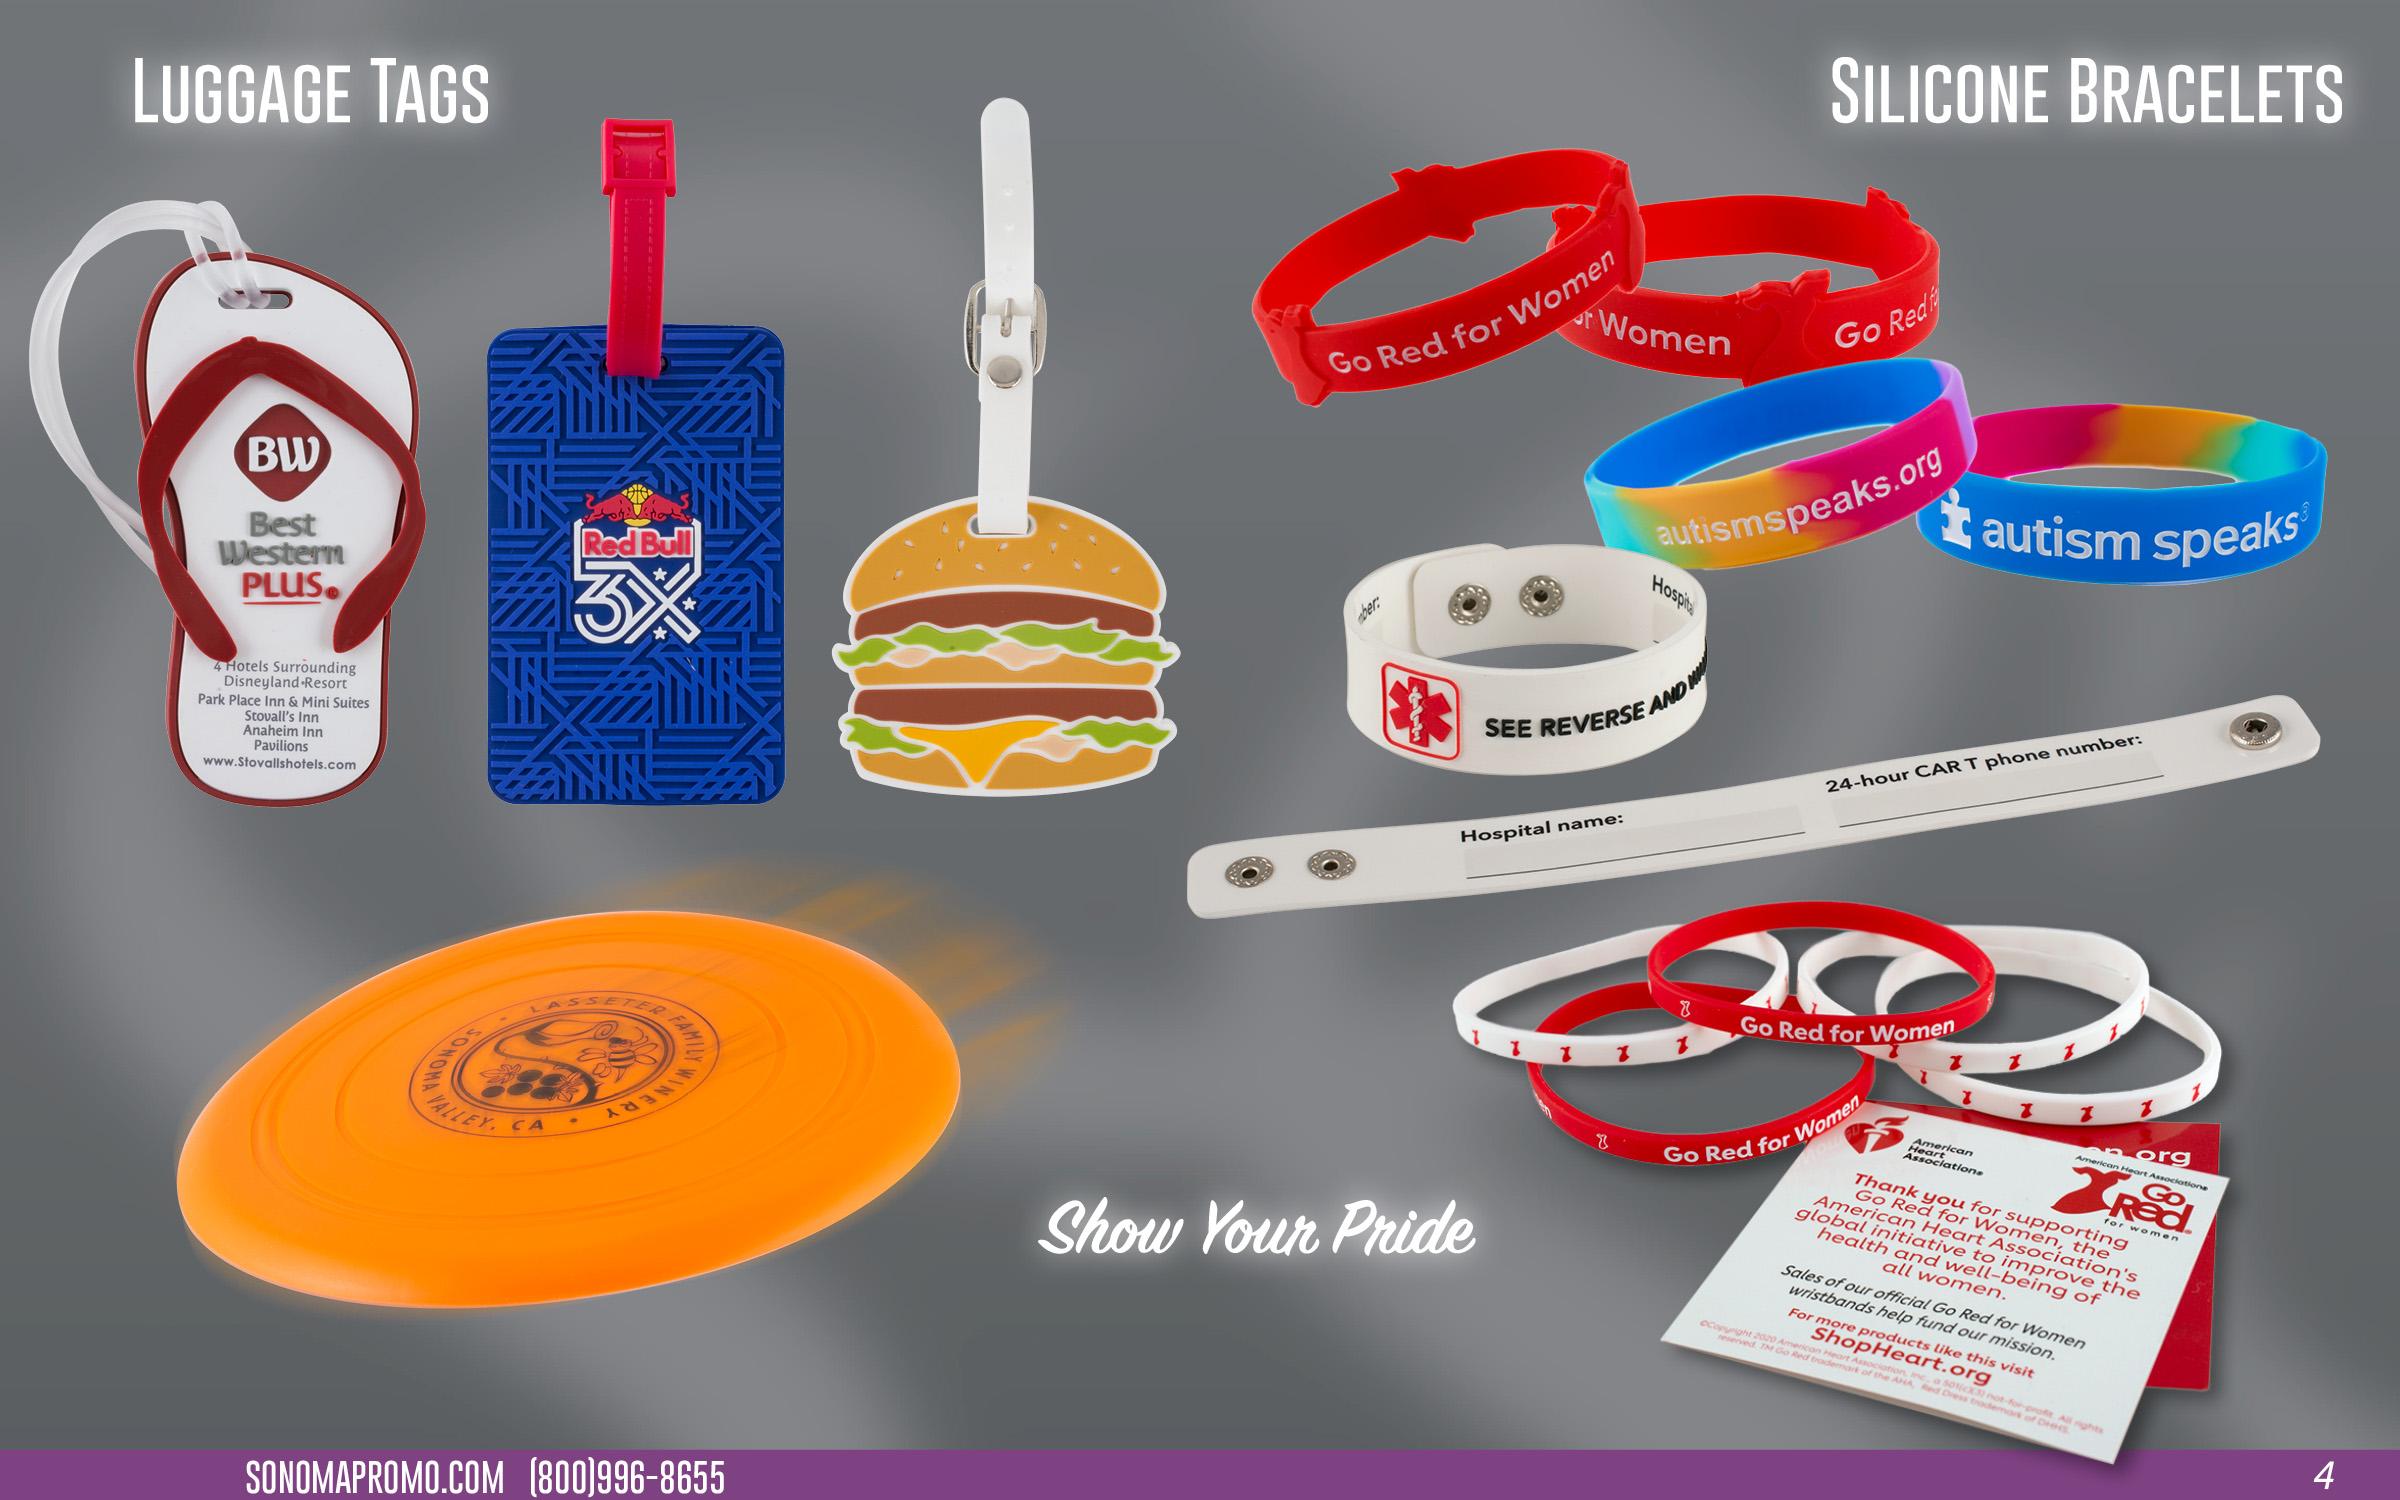 Luggage Tags & Silicone Bracelets